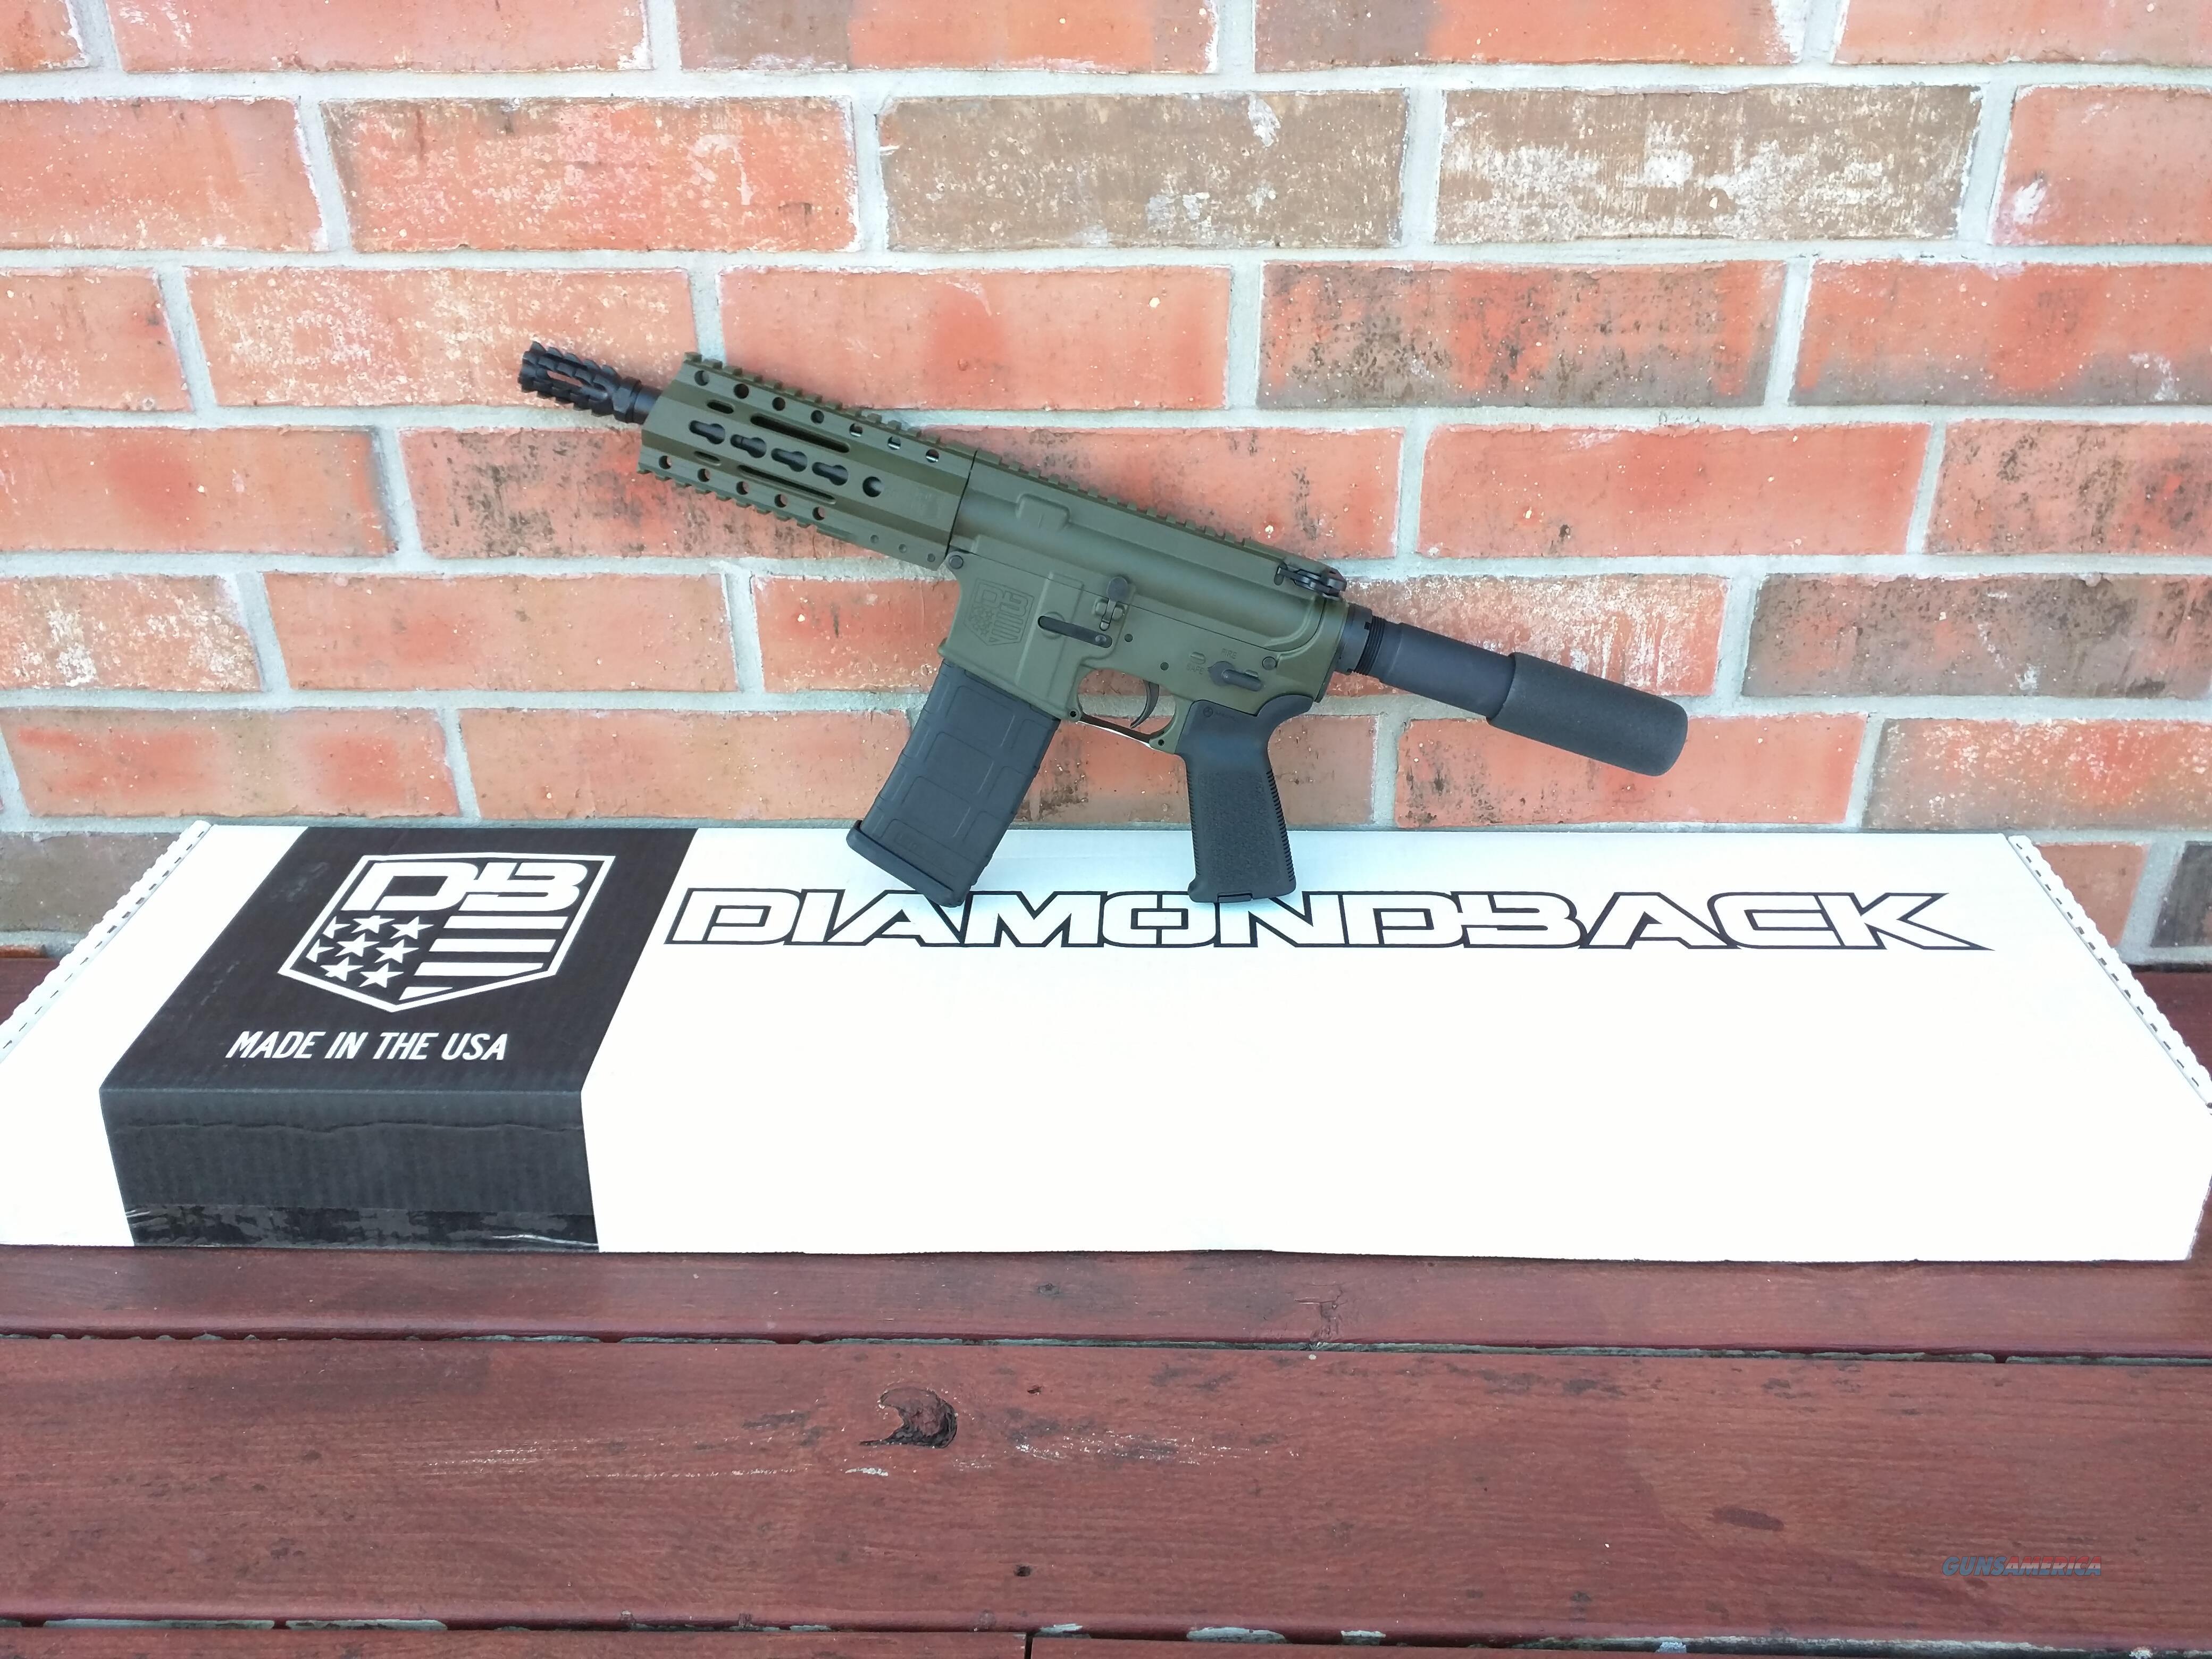 "Diamondback AR15 AR 15 DB 15 Pistol 5.56/223 NIB 7.5"" OD Green 30 Rd Muzzle Brake FREE LAYAWAY  Guns > Rifles > AR-15 Rifles - Small Manufacturers > Complete Rifle"